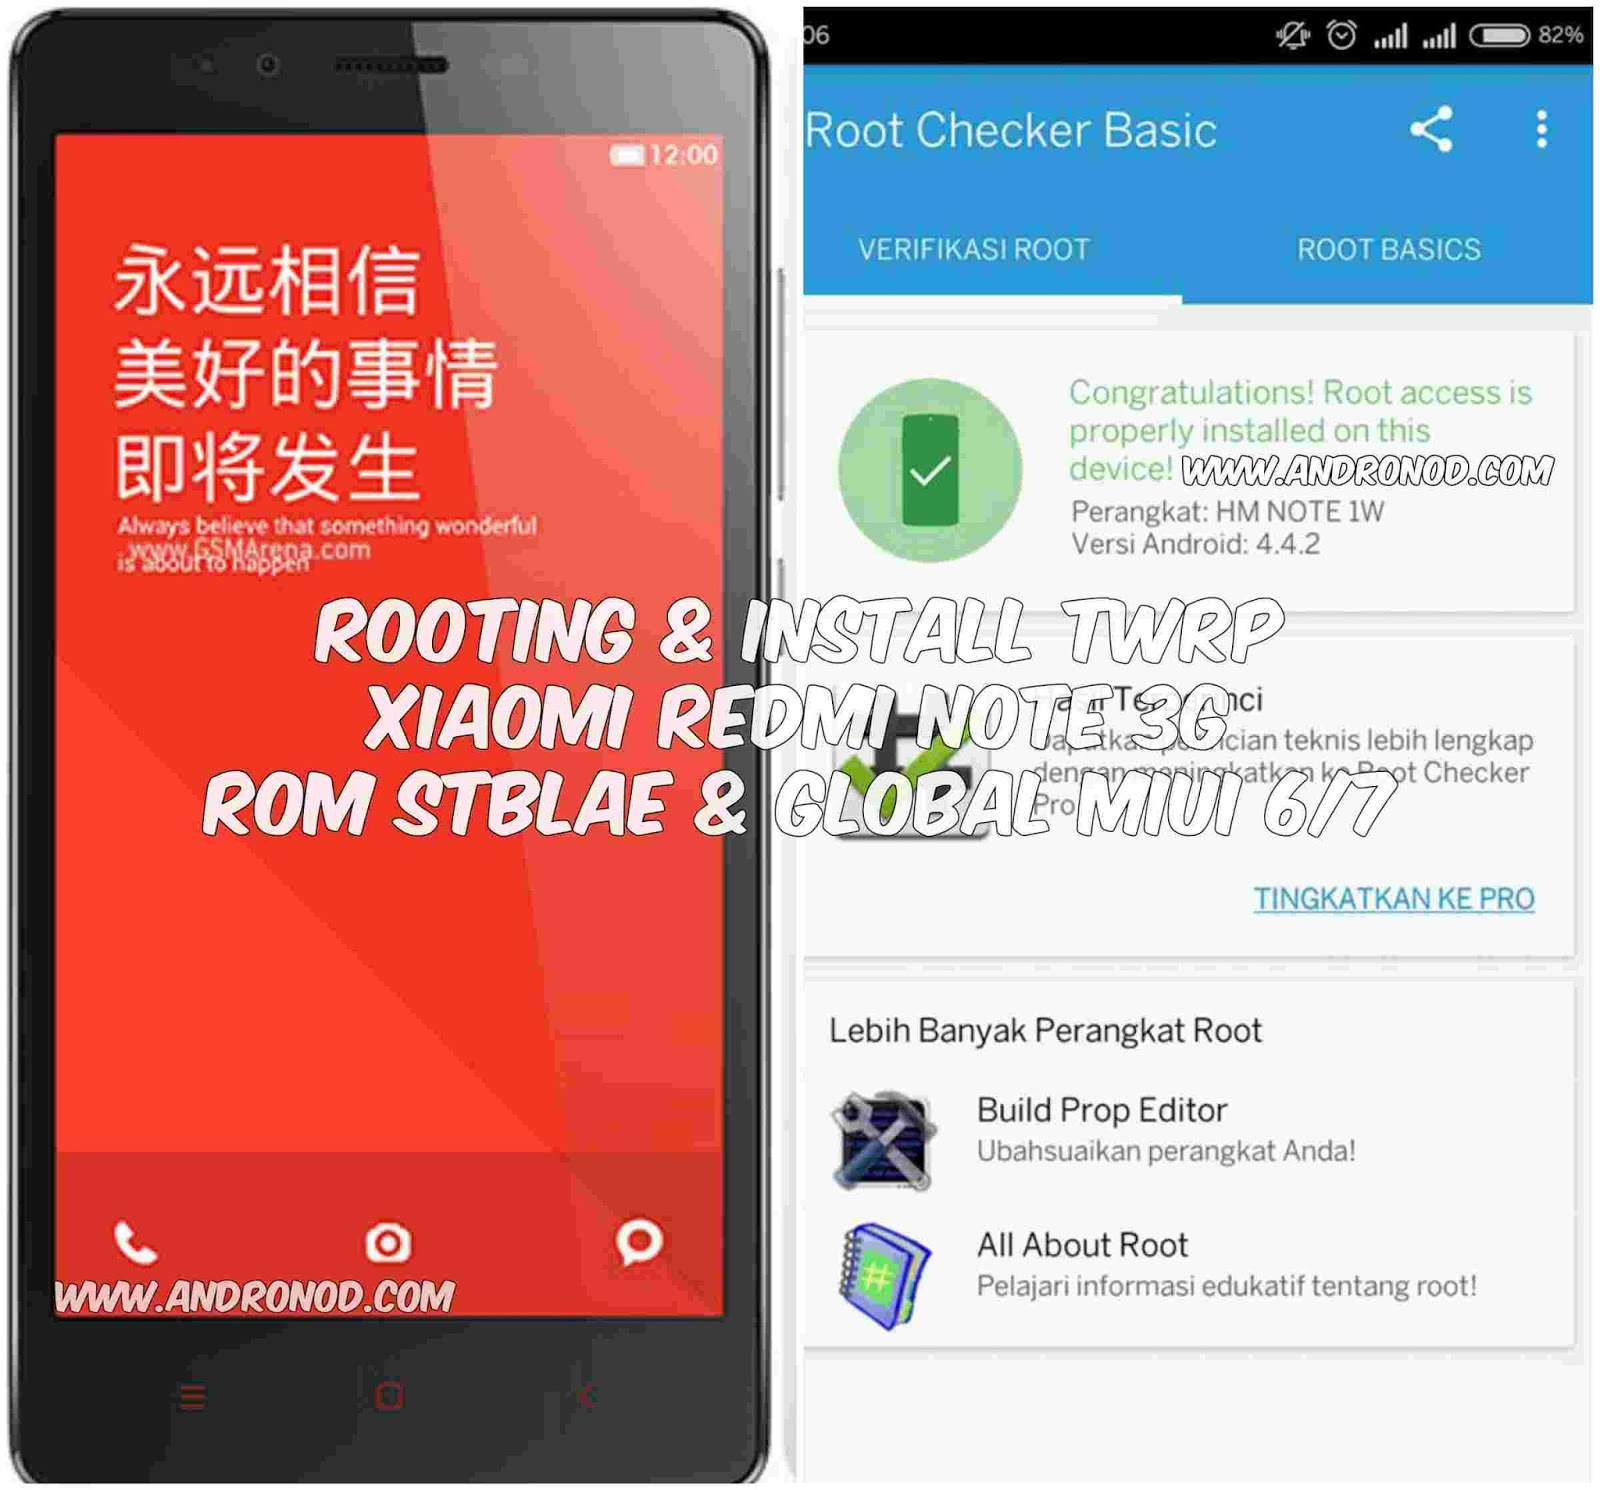 Cara Root dan Install TWRP Xiaomi Redmi Note 3G ROM MIUI 7 - Andronod